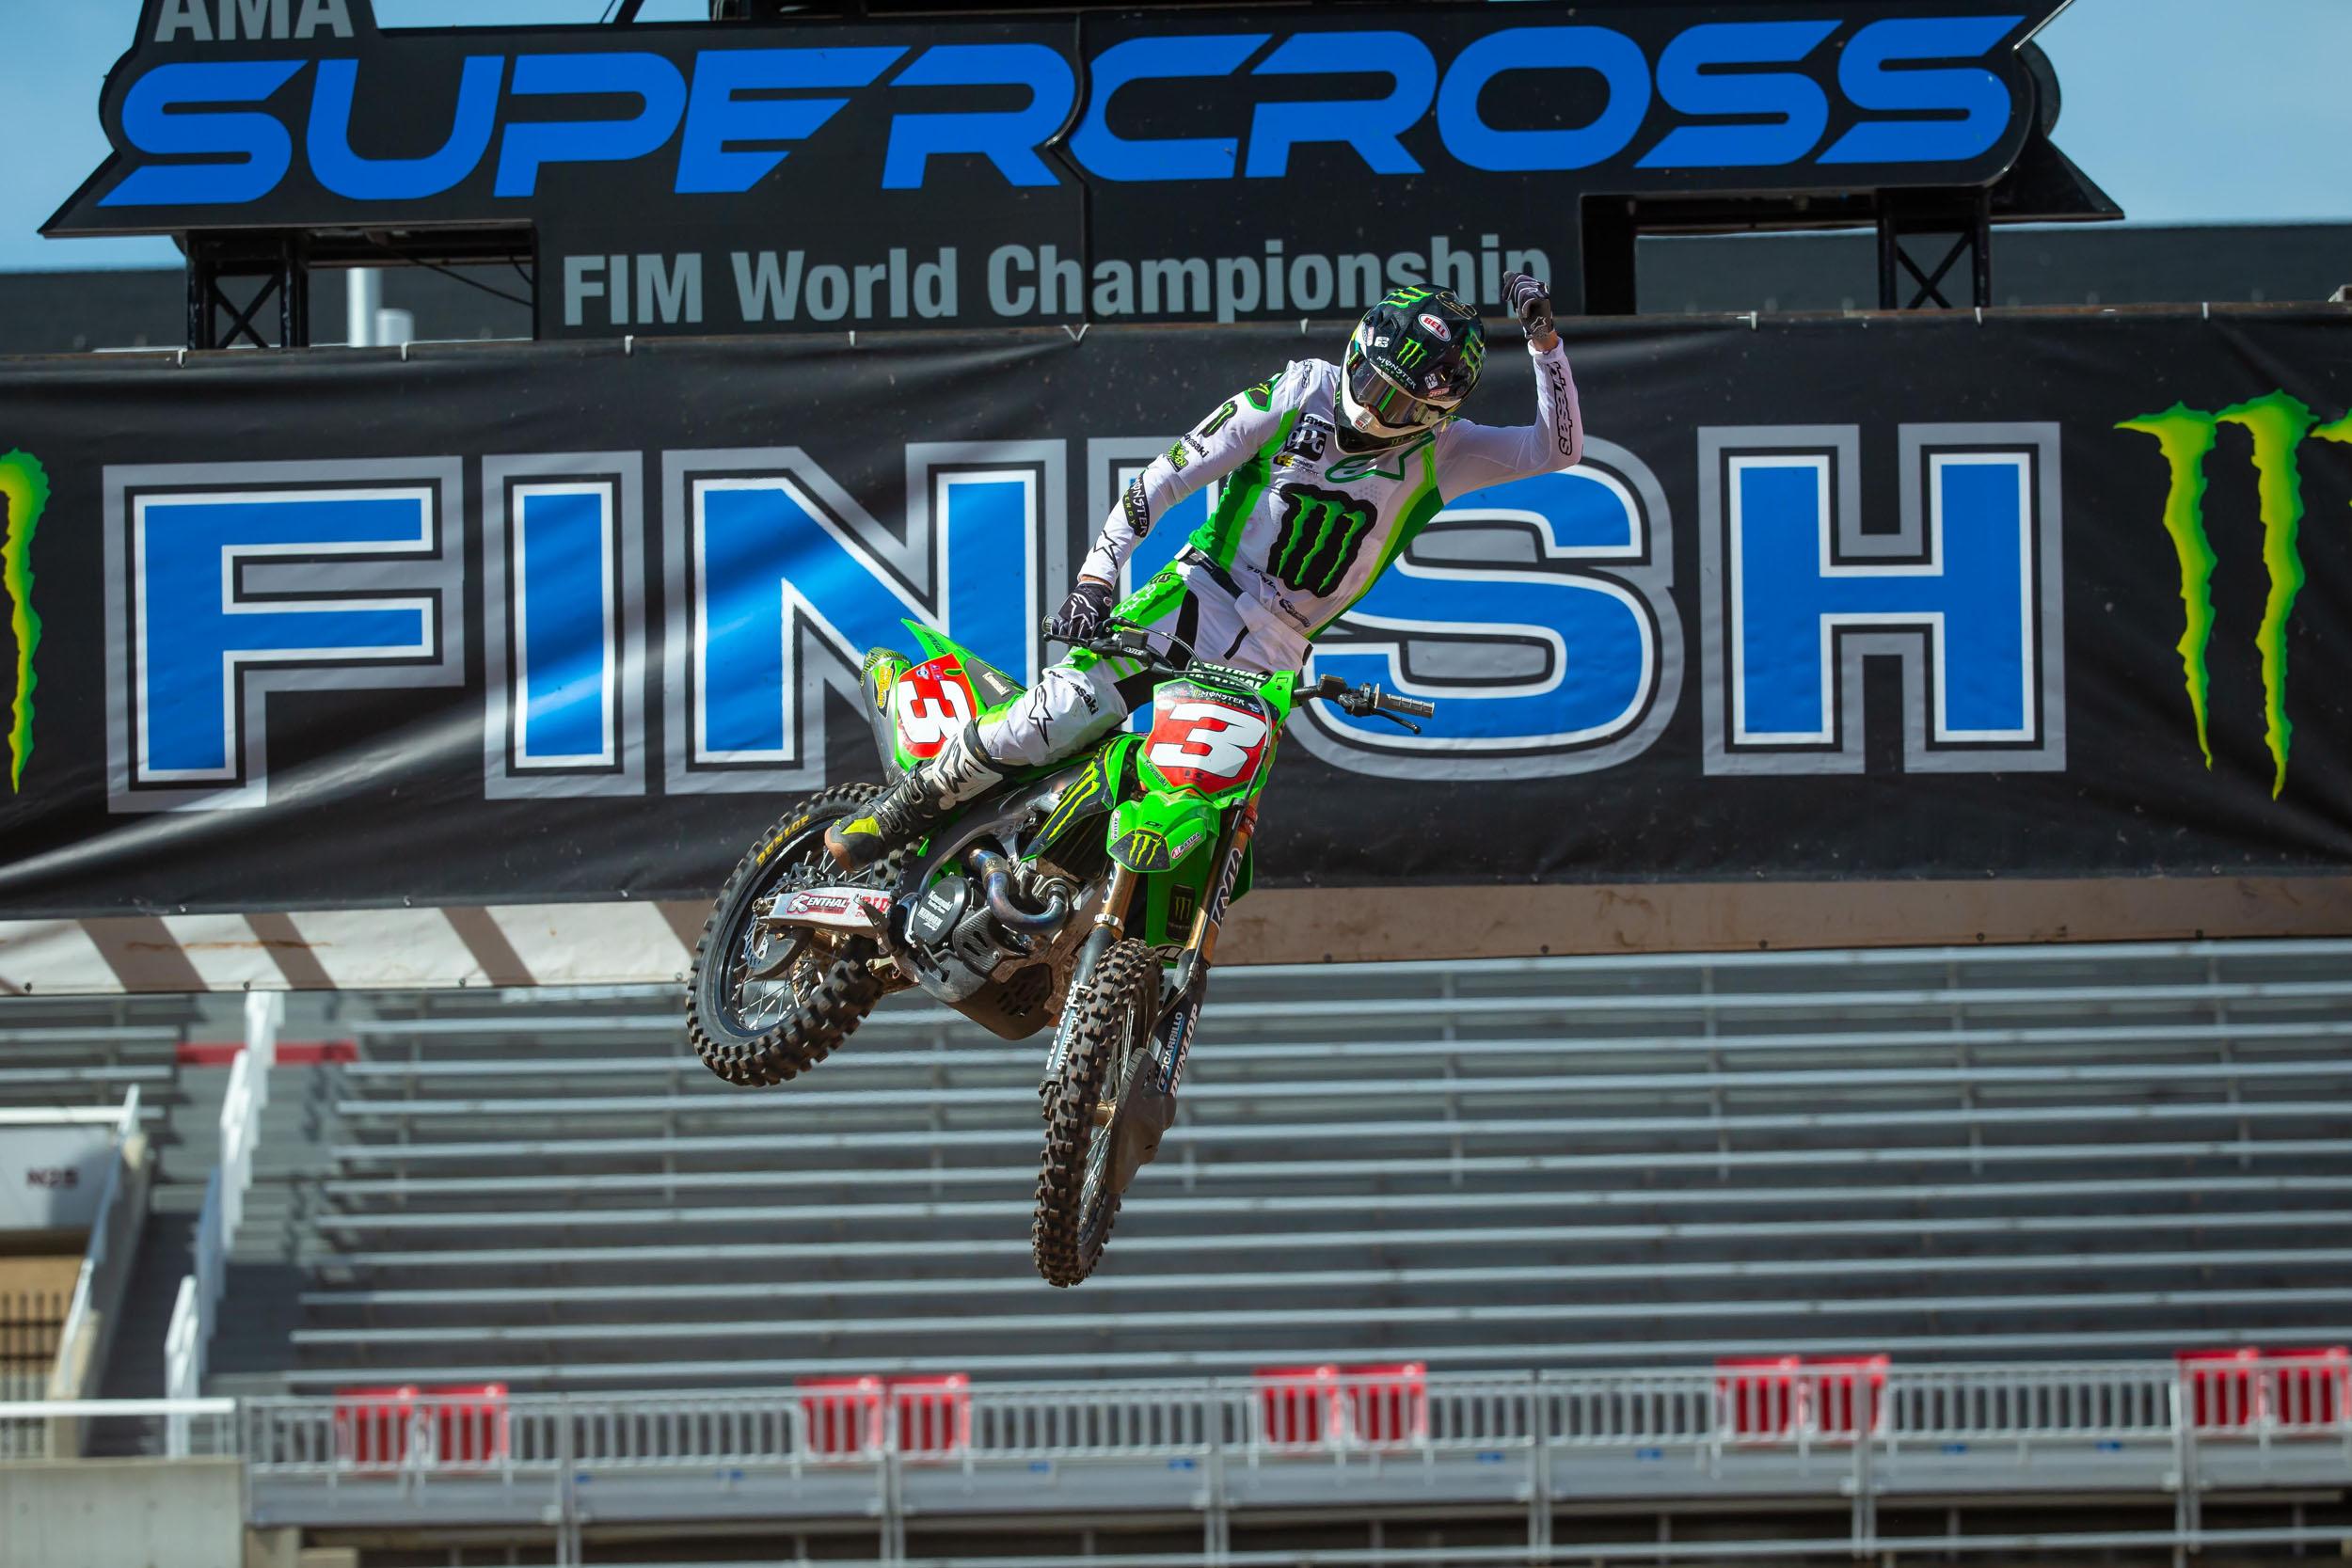 Eli Tomac grabbed his first Monster Energy Supercross title